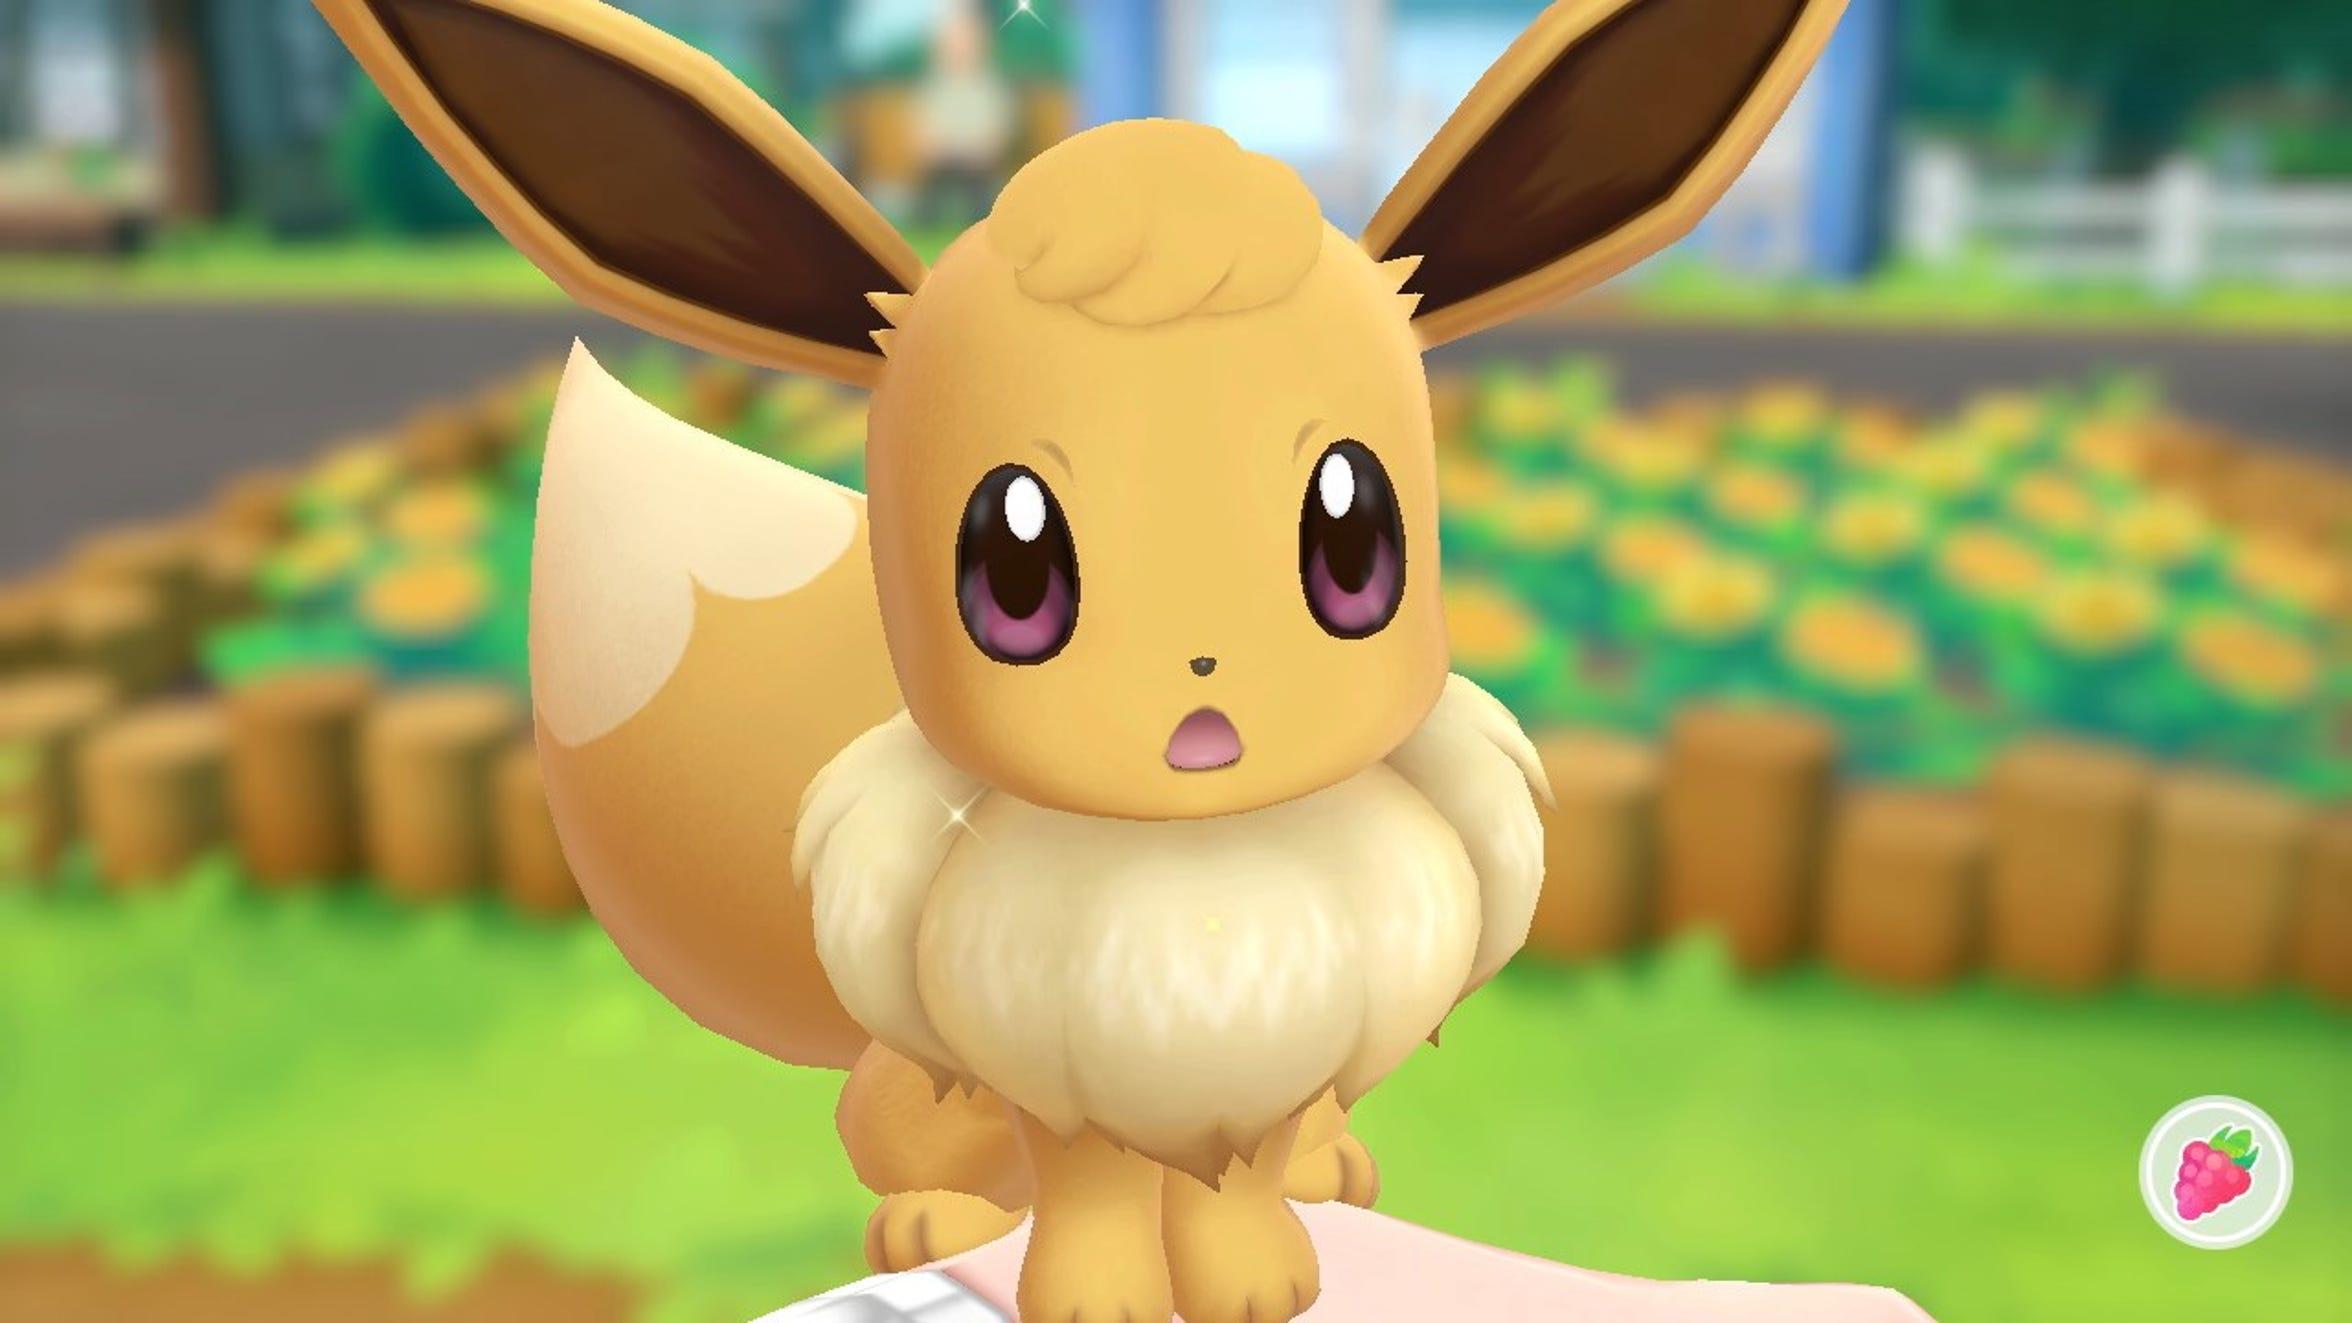 """Pokemon: Let's Go! Pikachu"" and ""Pokemon: Let's Go! Eveee"" for Nintendo Switch."